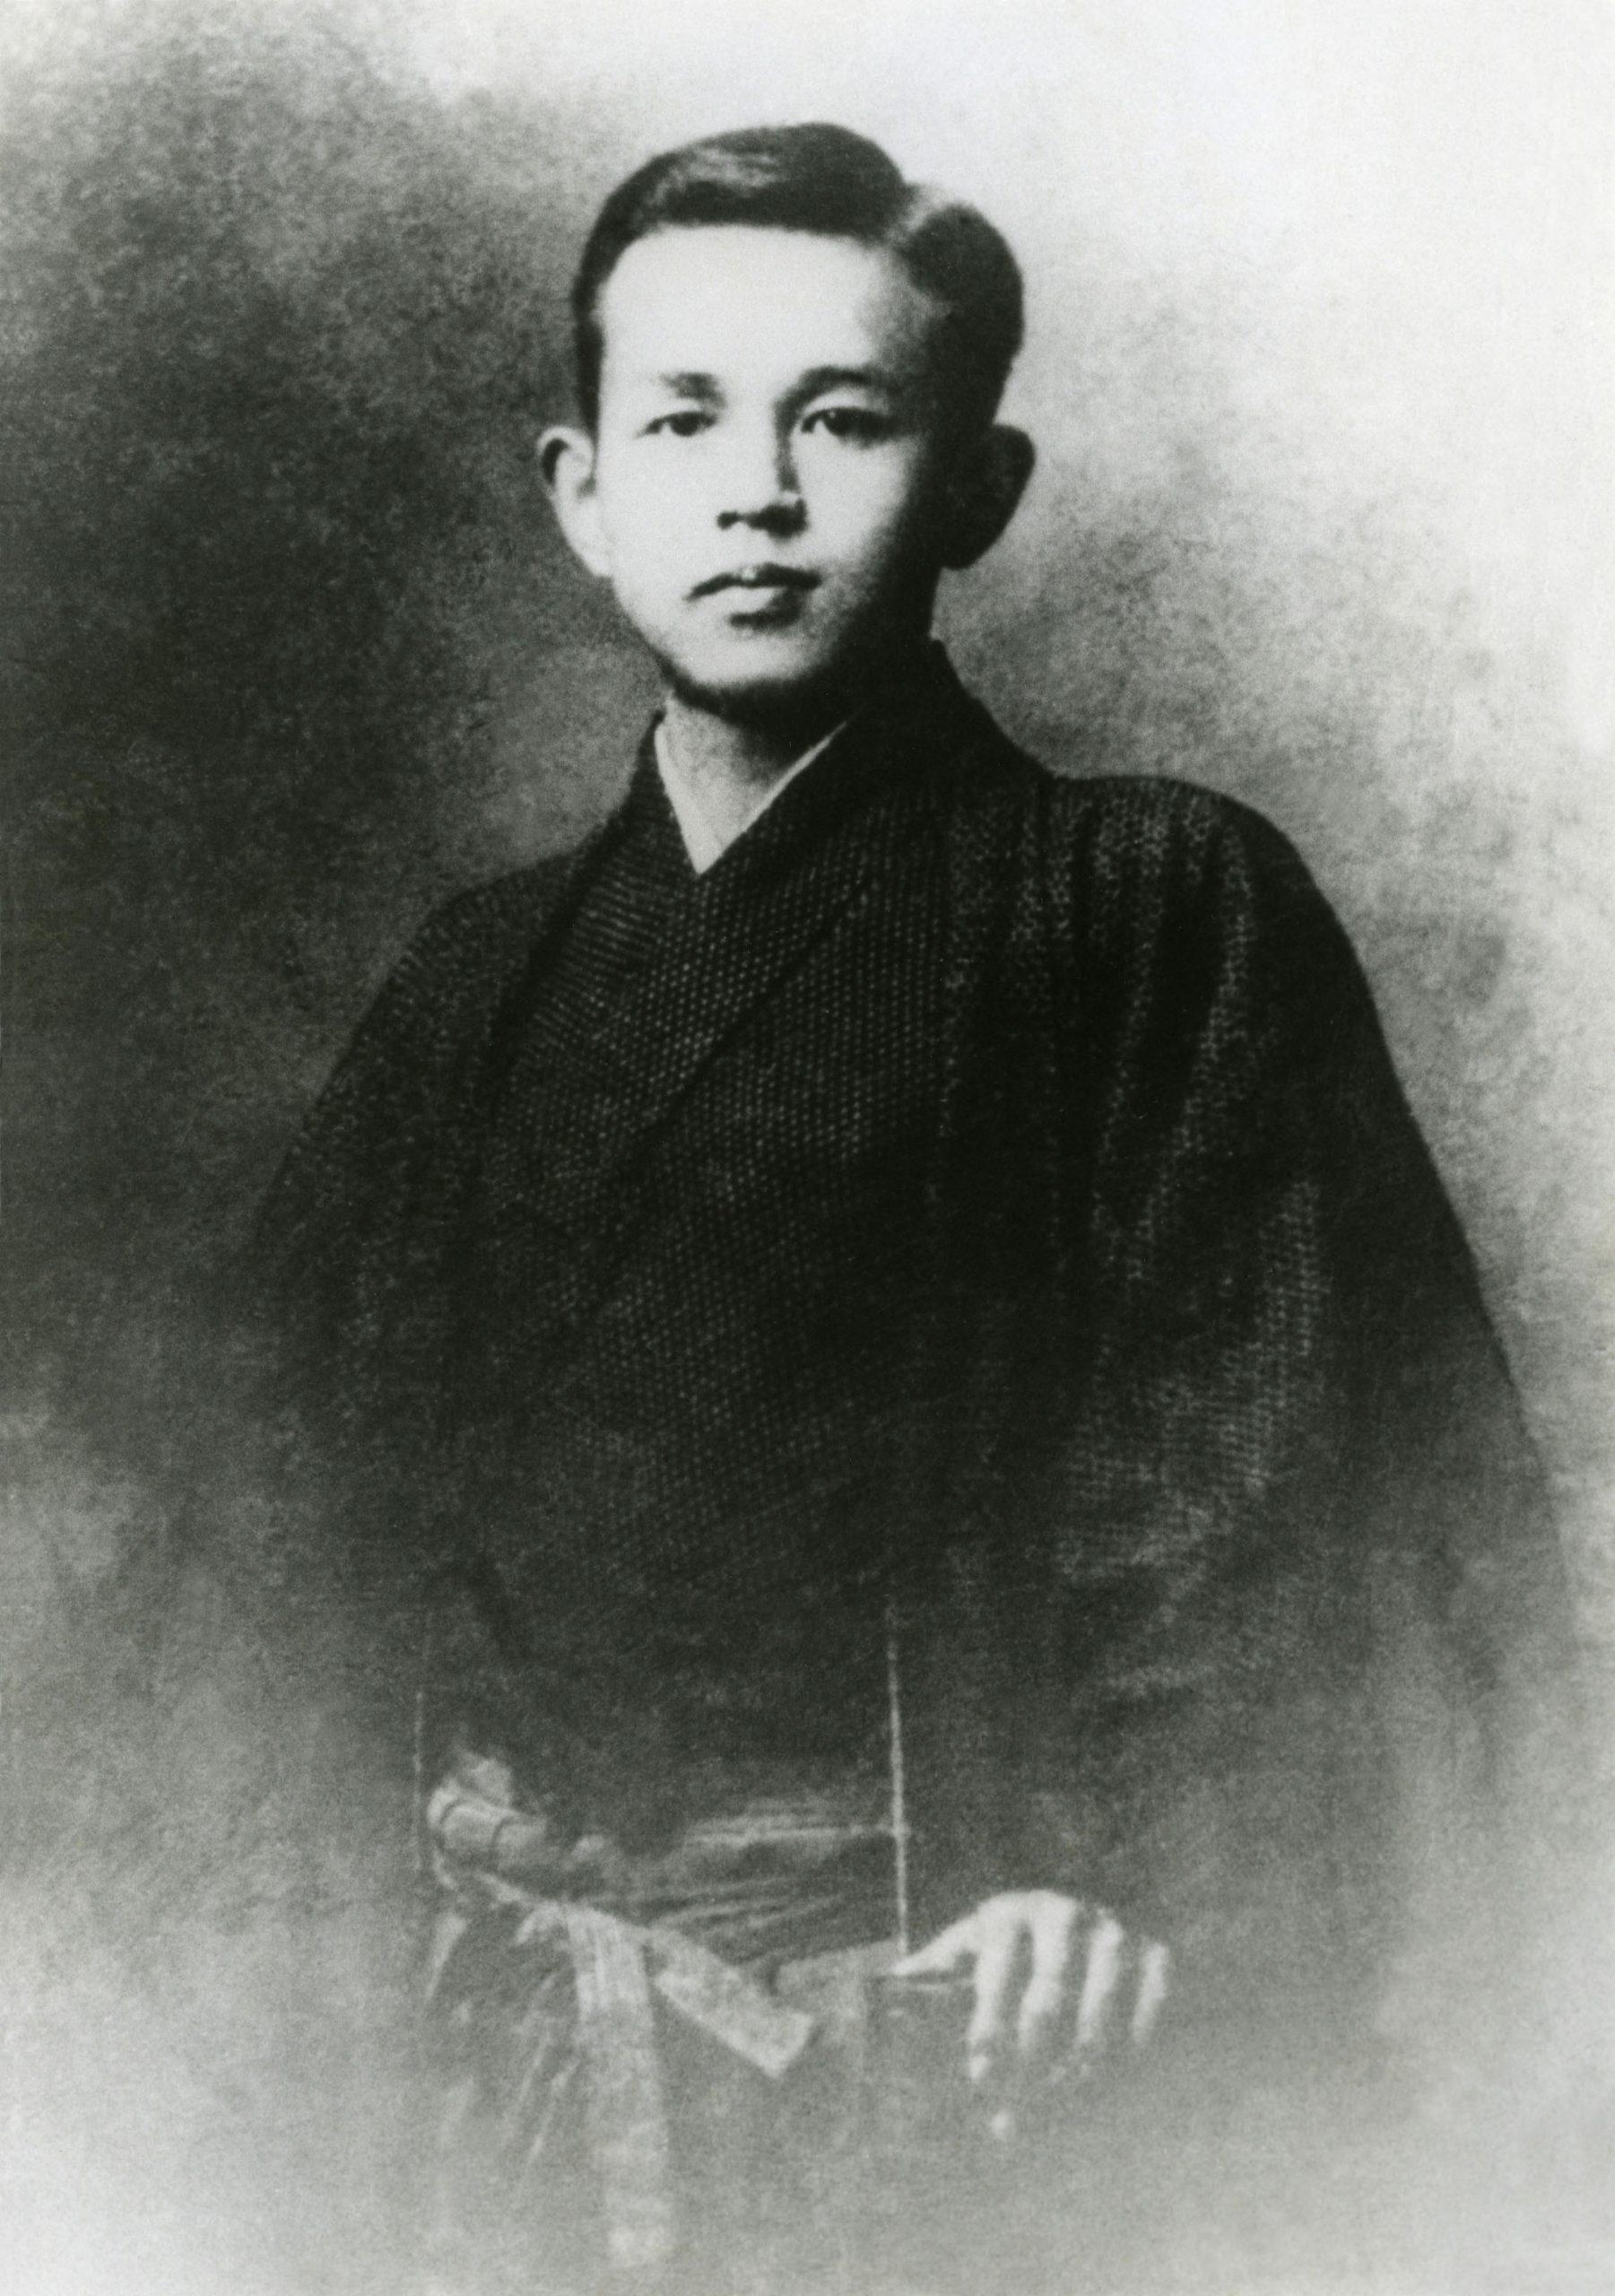 Takuboku (Такубоку) Ishikawa (Исикава) 石川 啄木